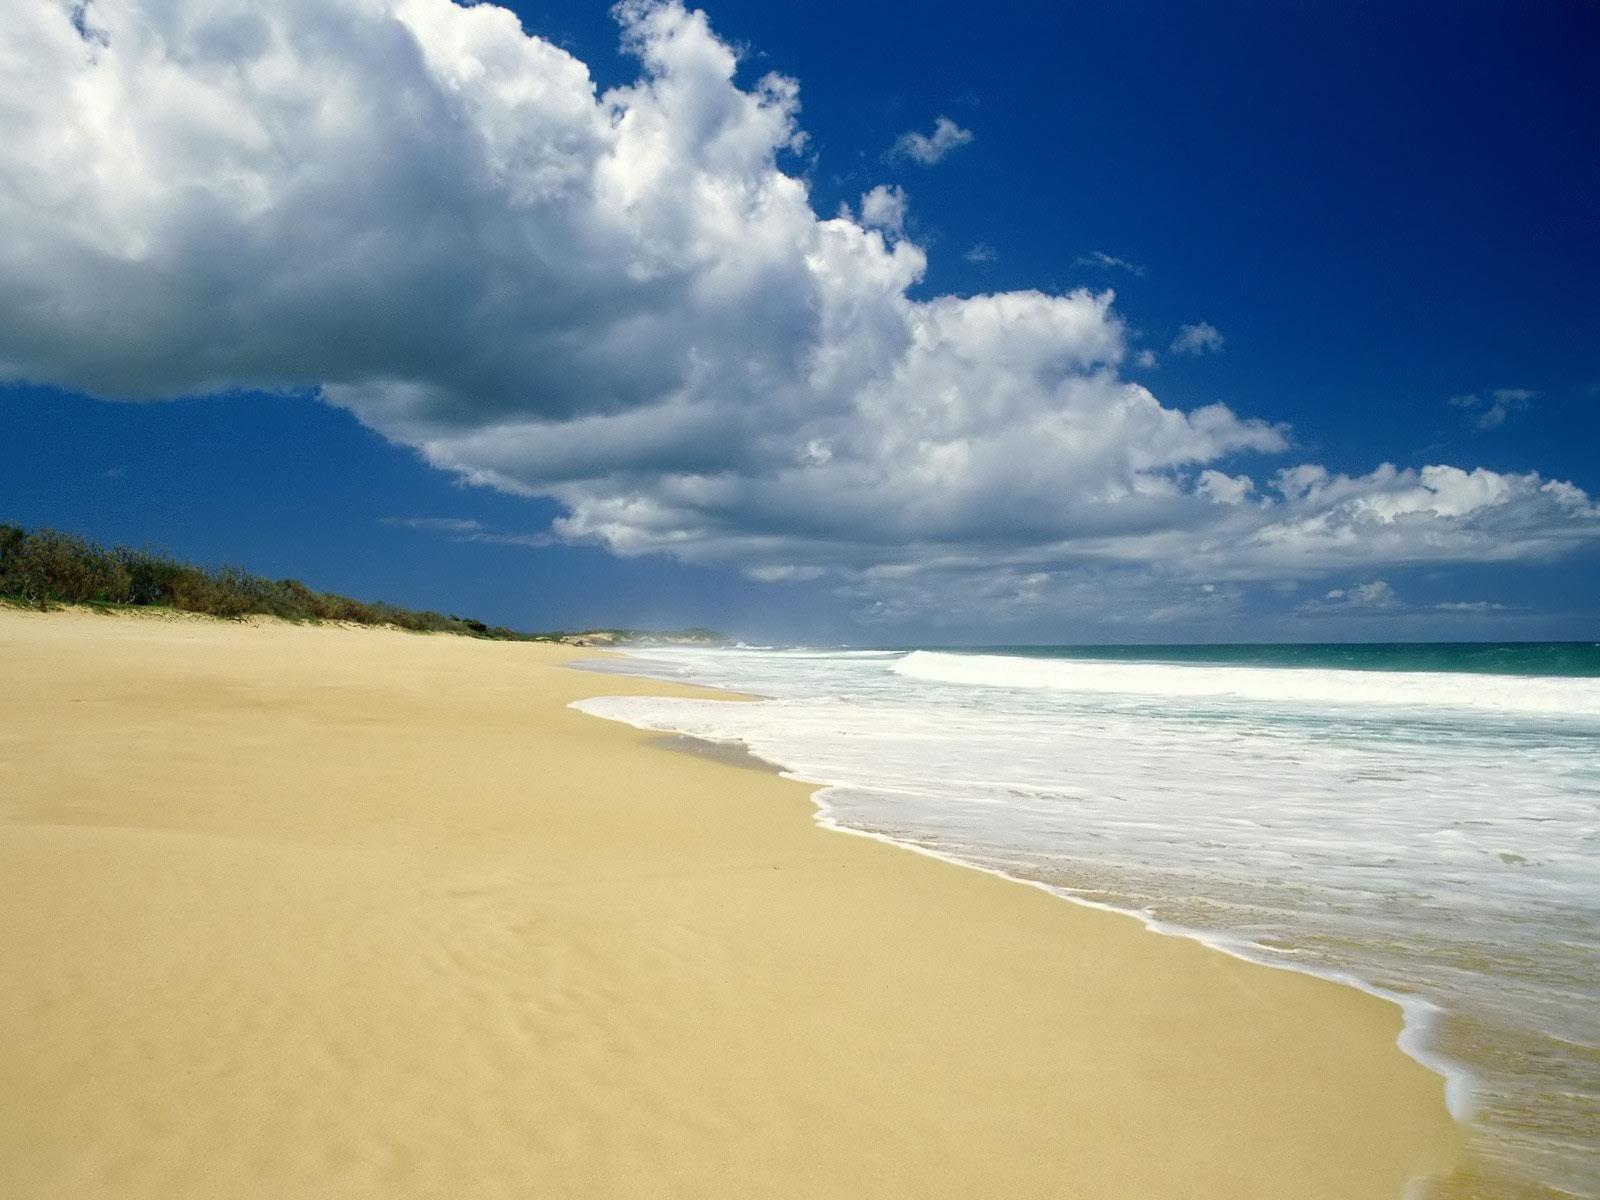 Hd Beach Wallpapers 1080p beach wallpapers 1600x1200